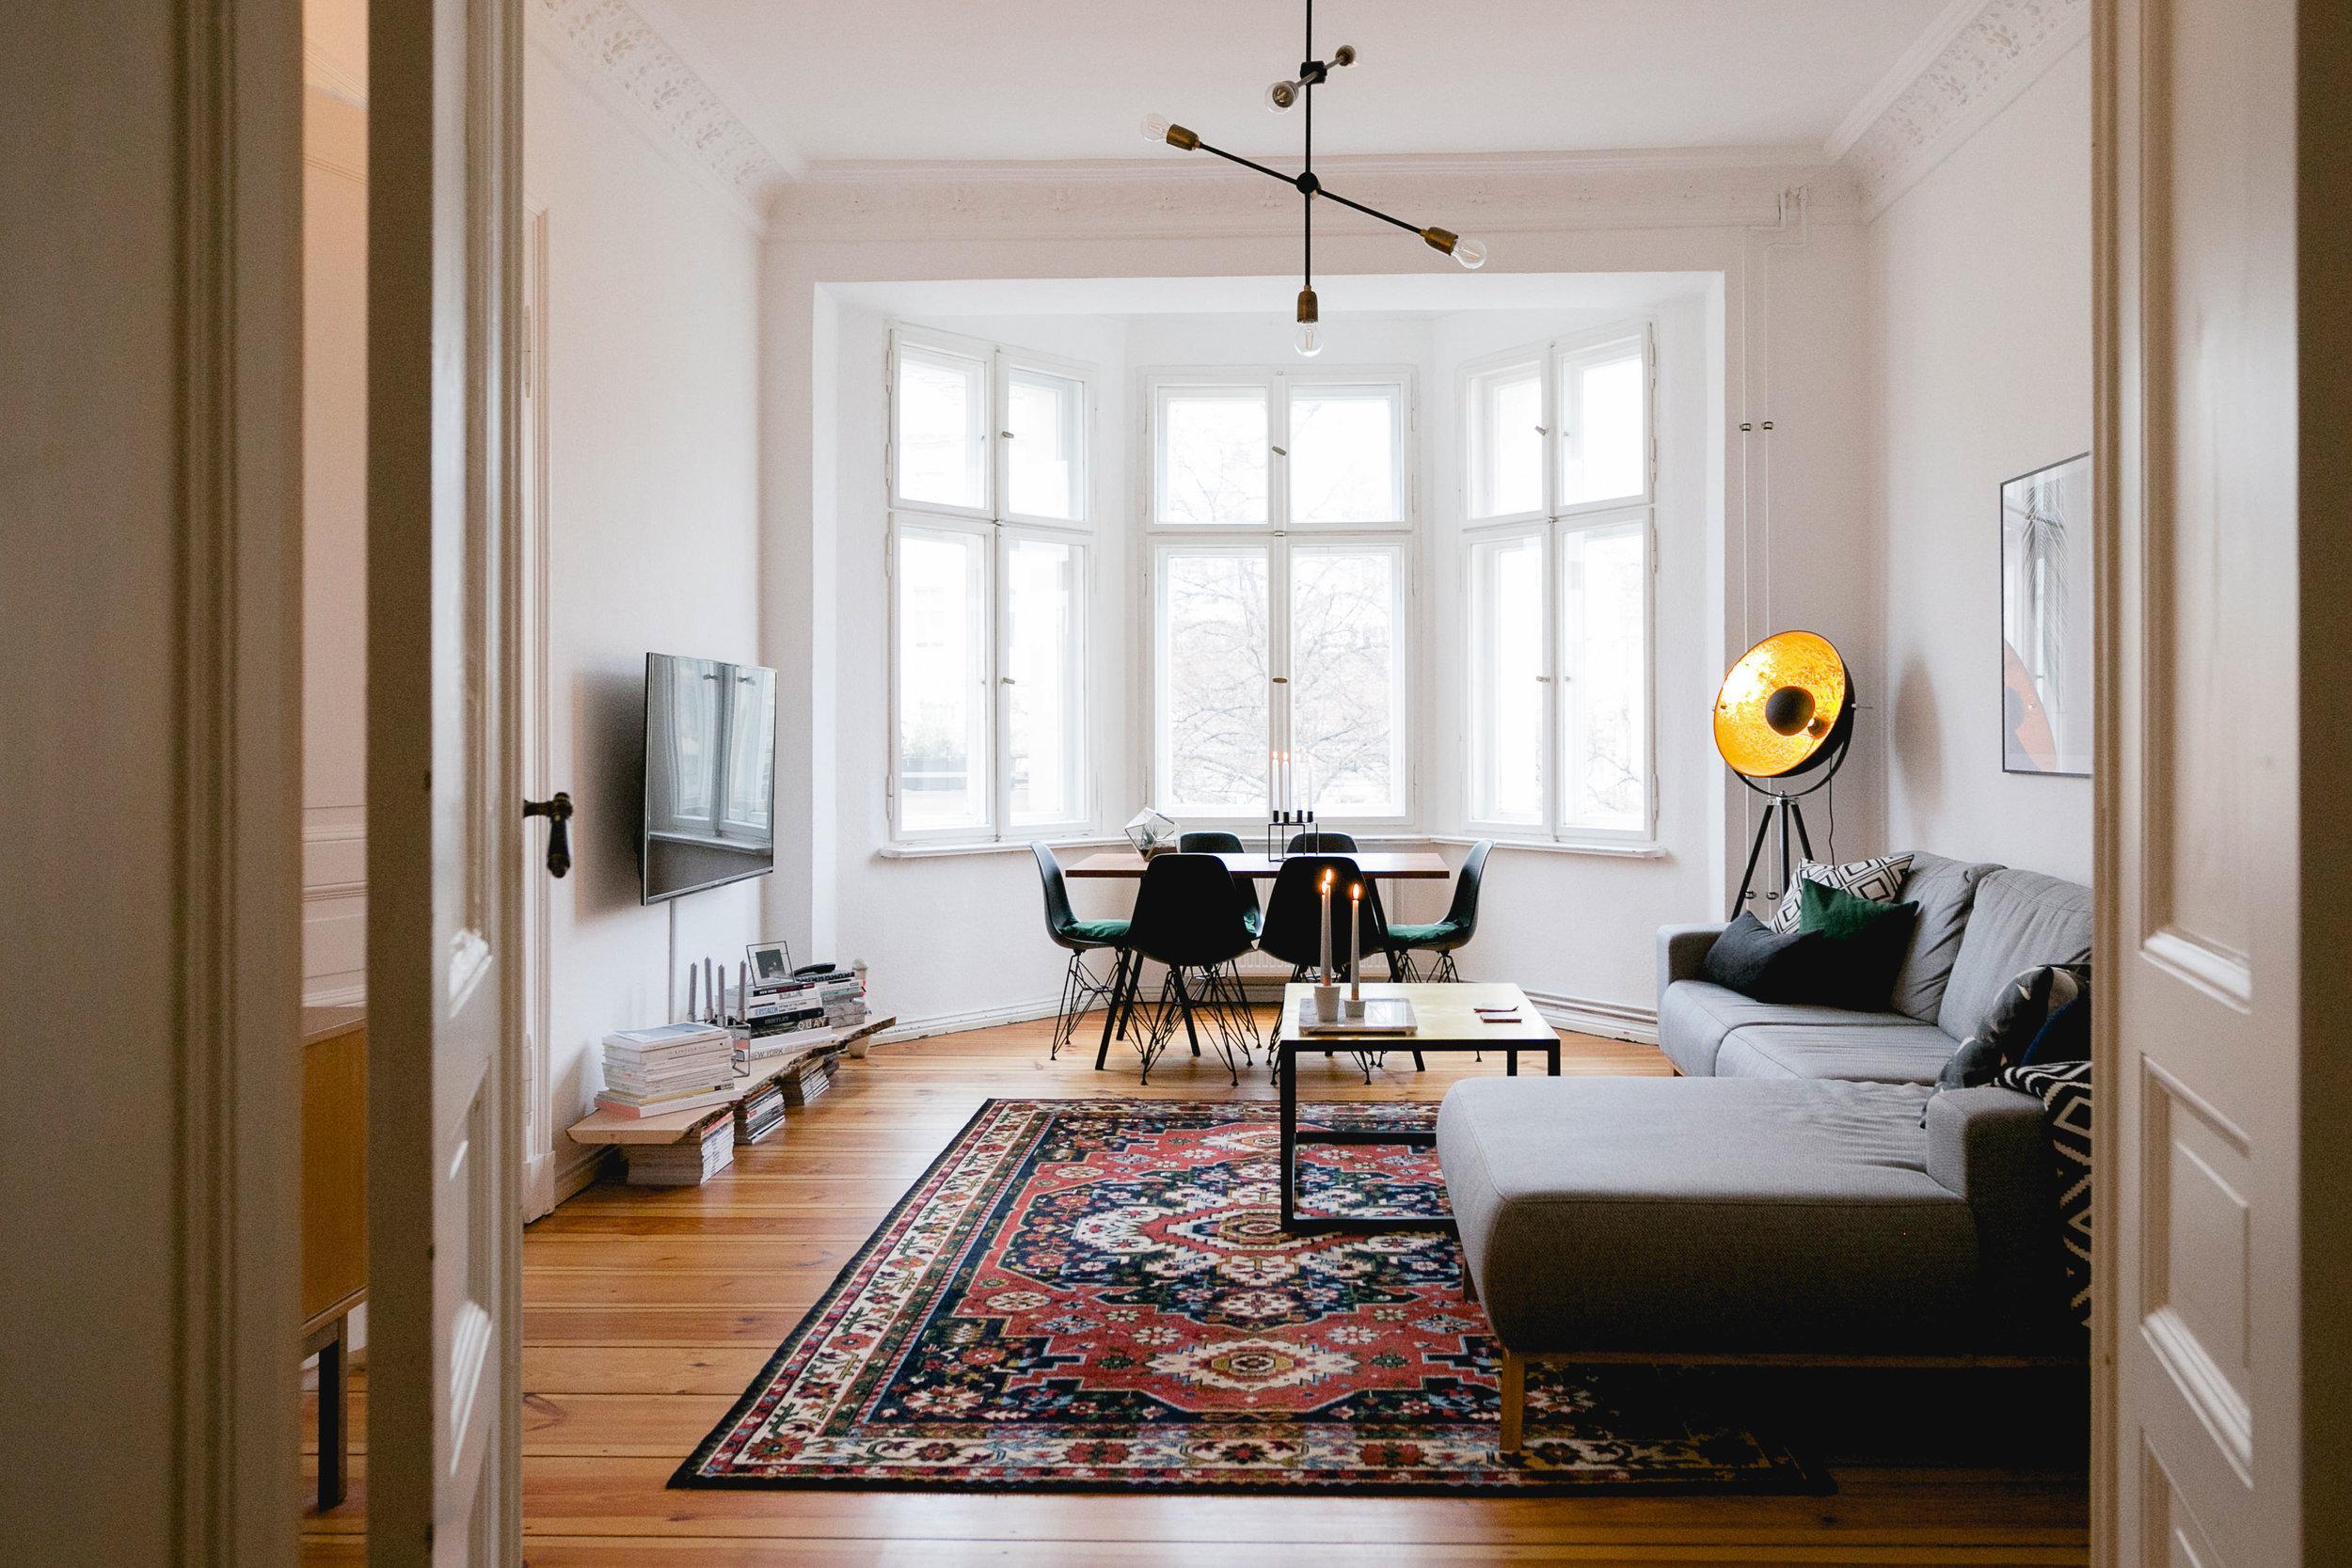 witandvoi_interiordesign_berlin_christina.jpg